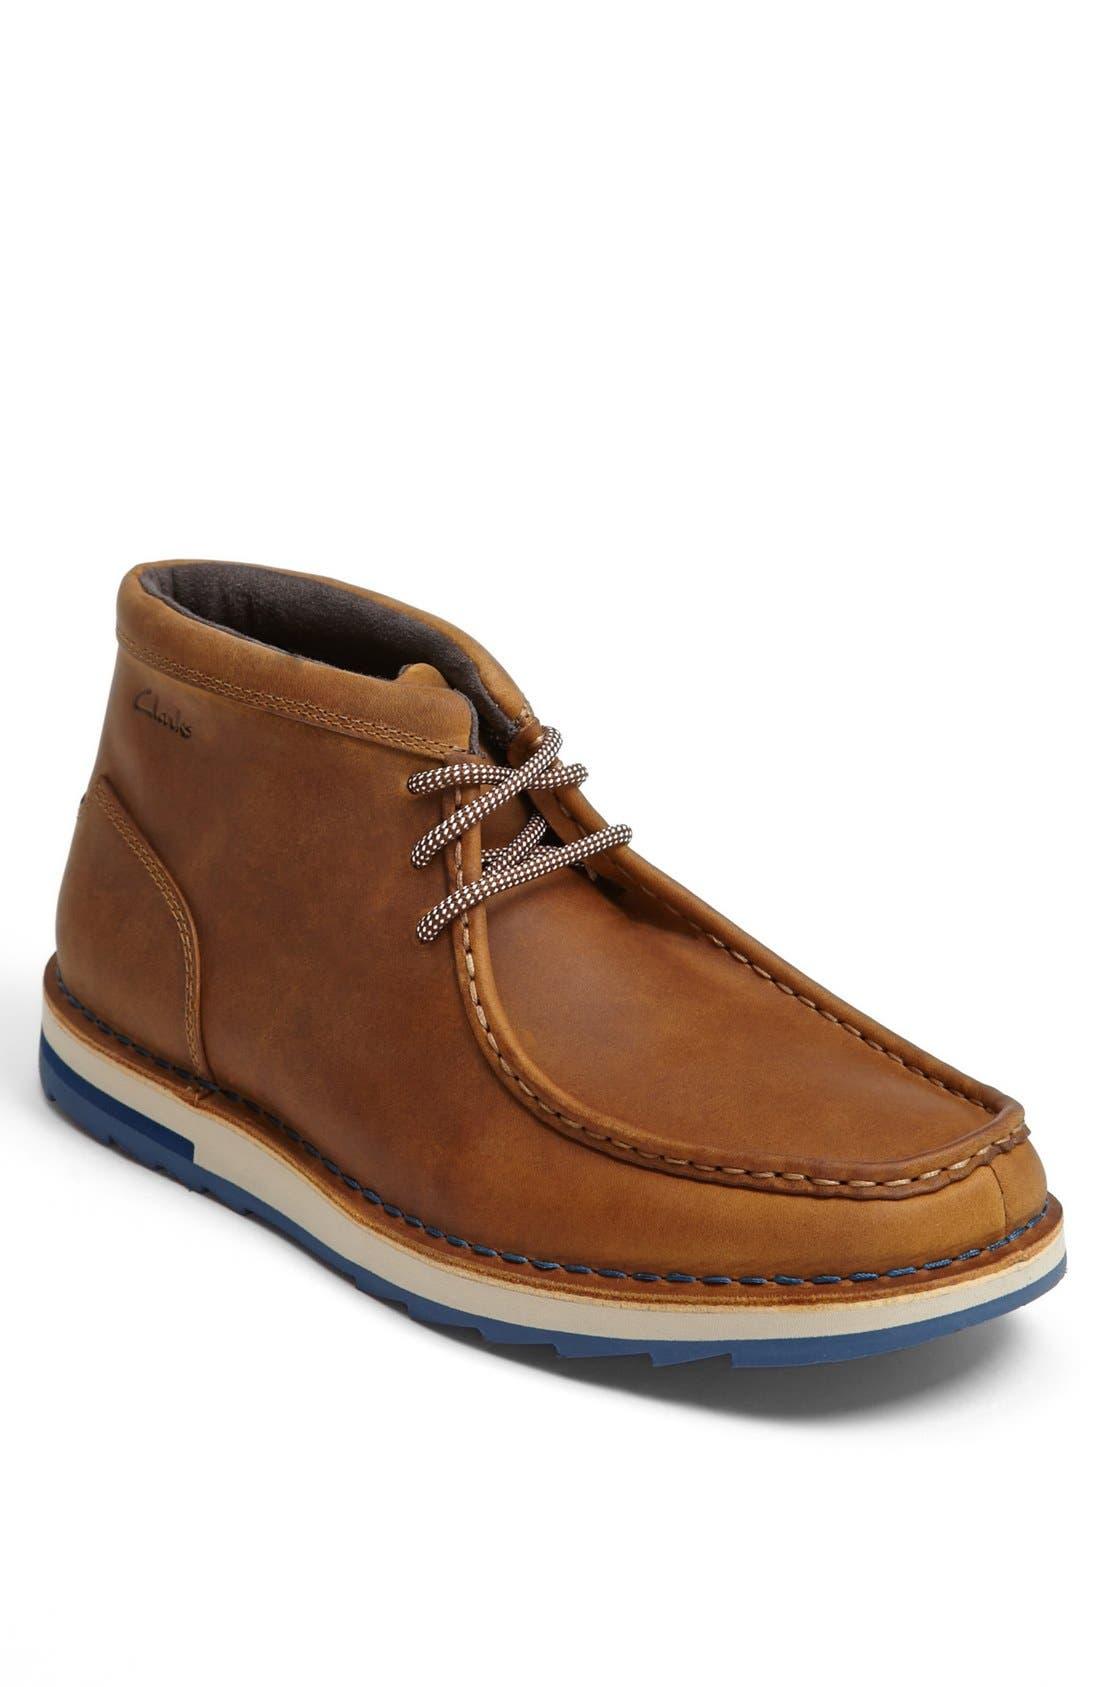 Alternate Image 1 Selected - Clarks® 'Folk' Moc Toe Chukka Boot